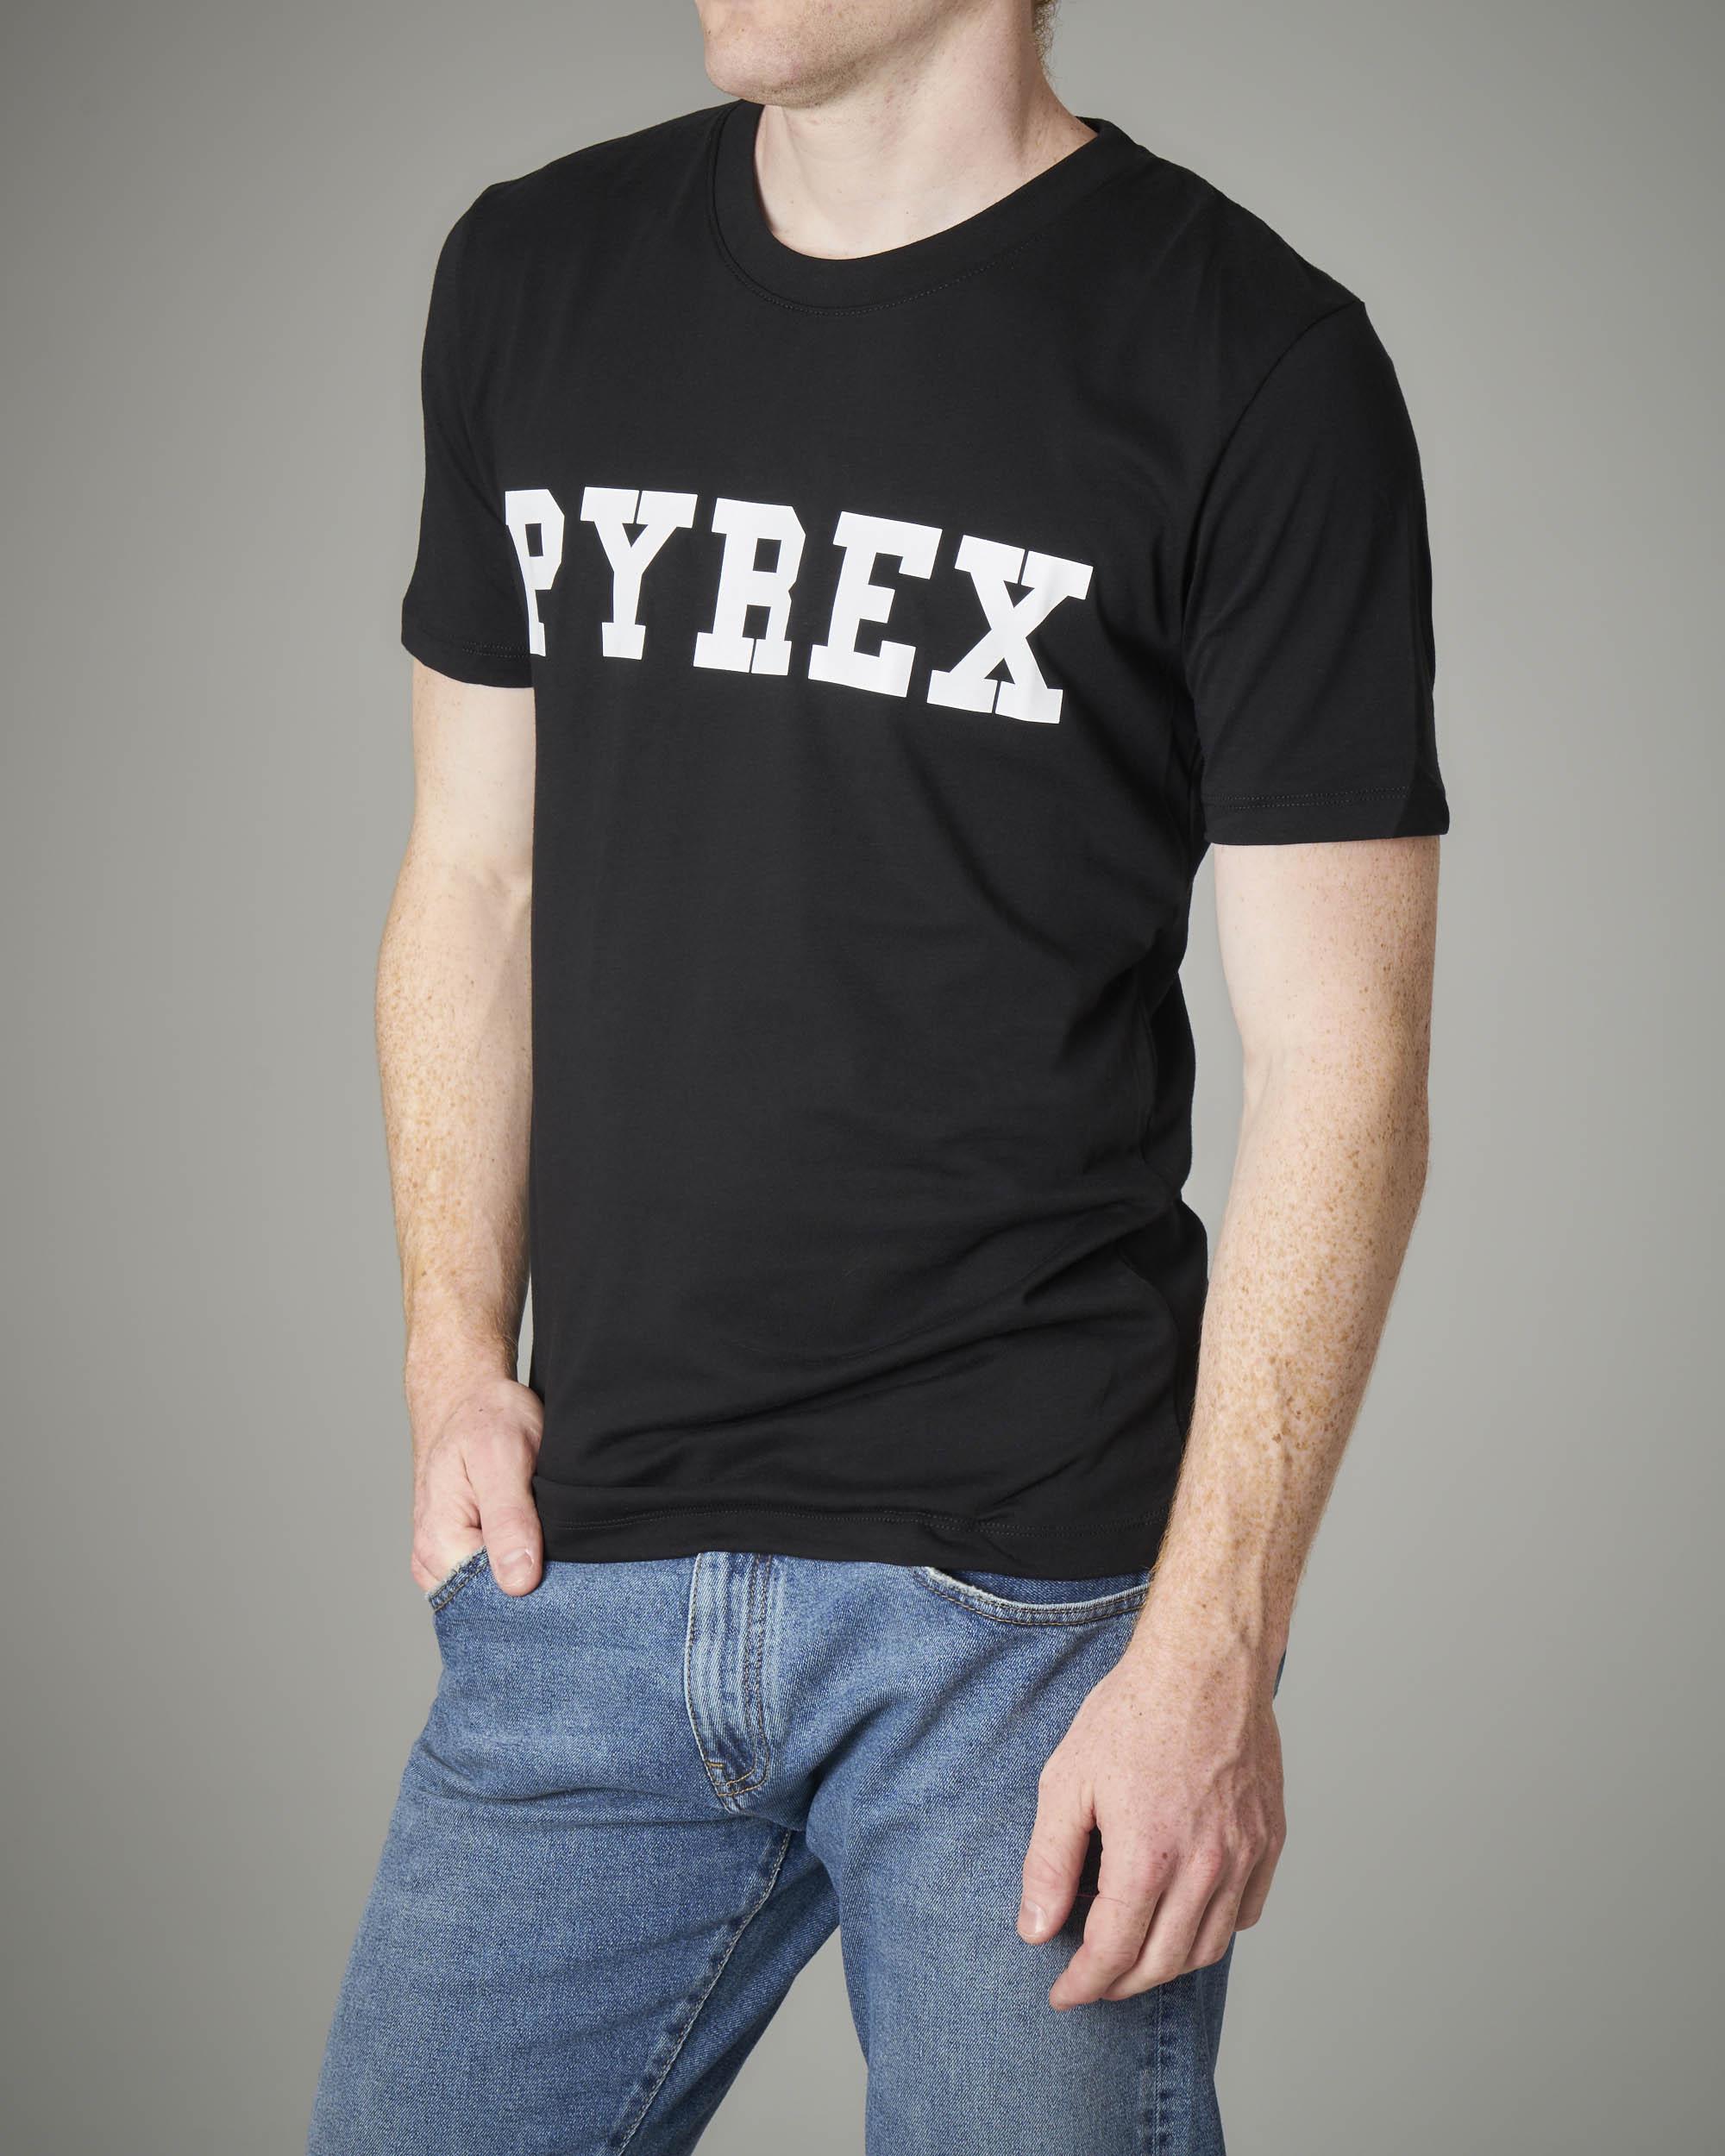 T-shirt nera con logo Pyrex bianco